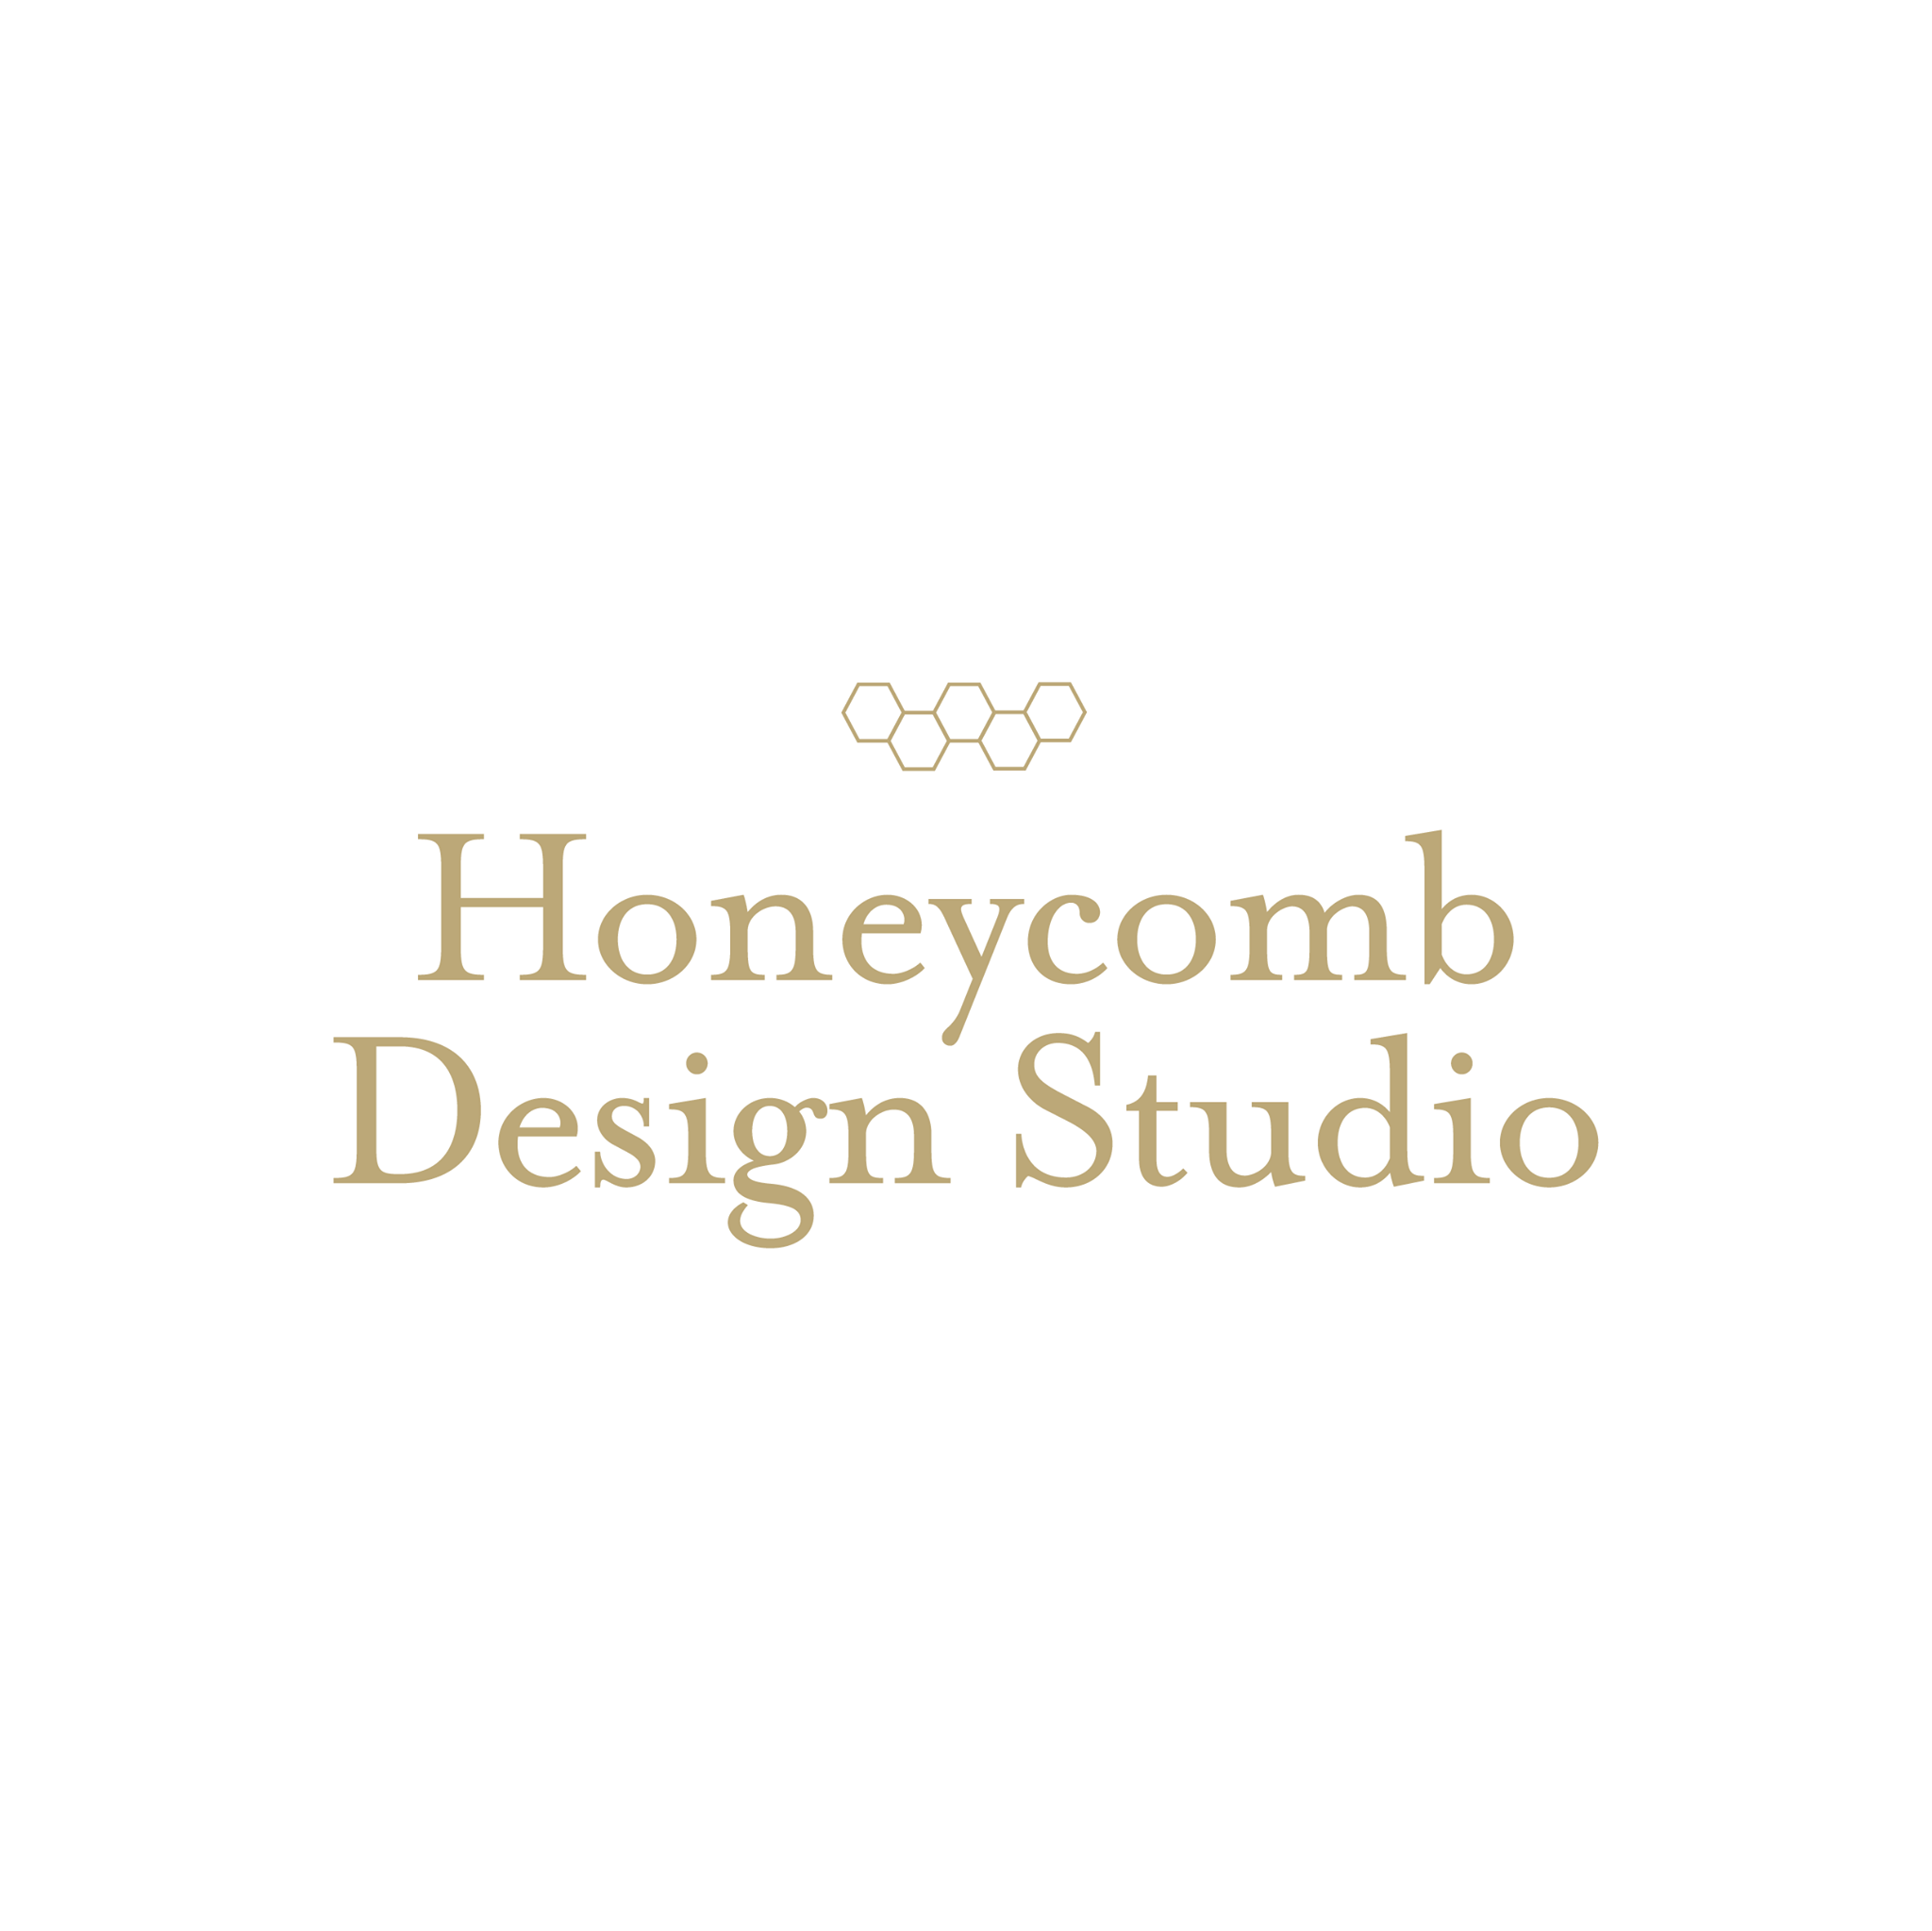 Honeycomb Design Studio